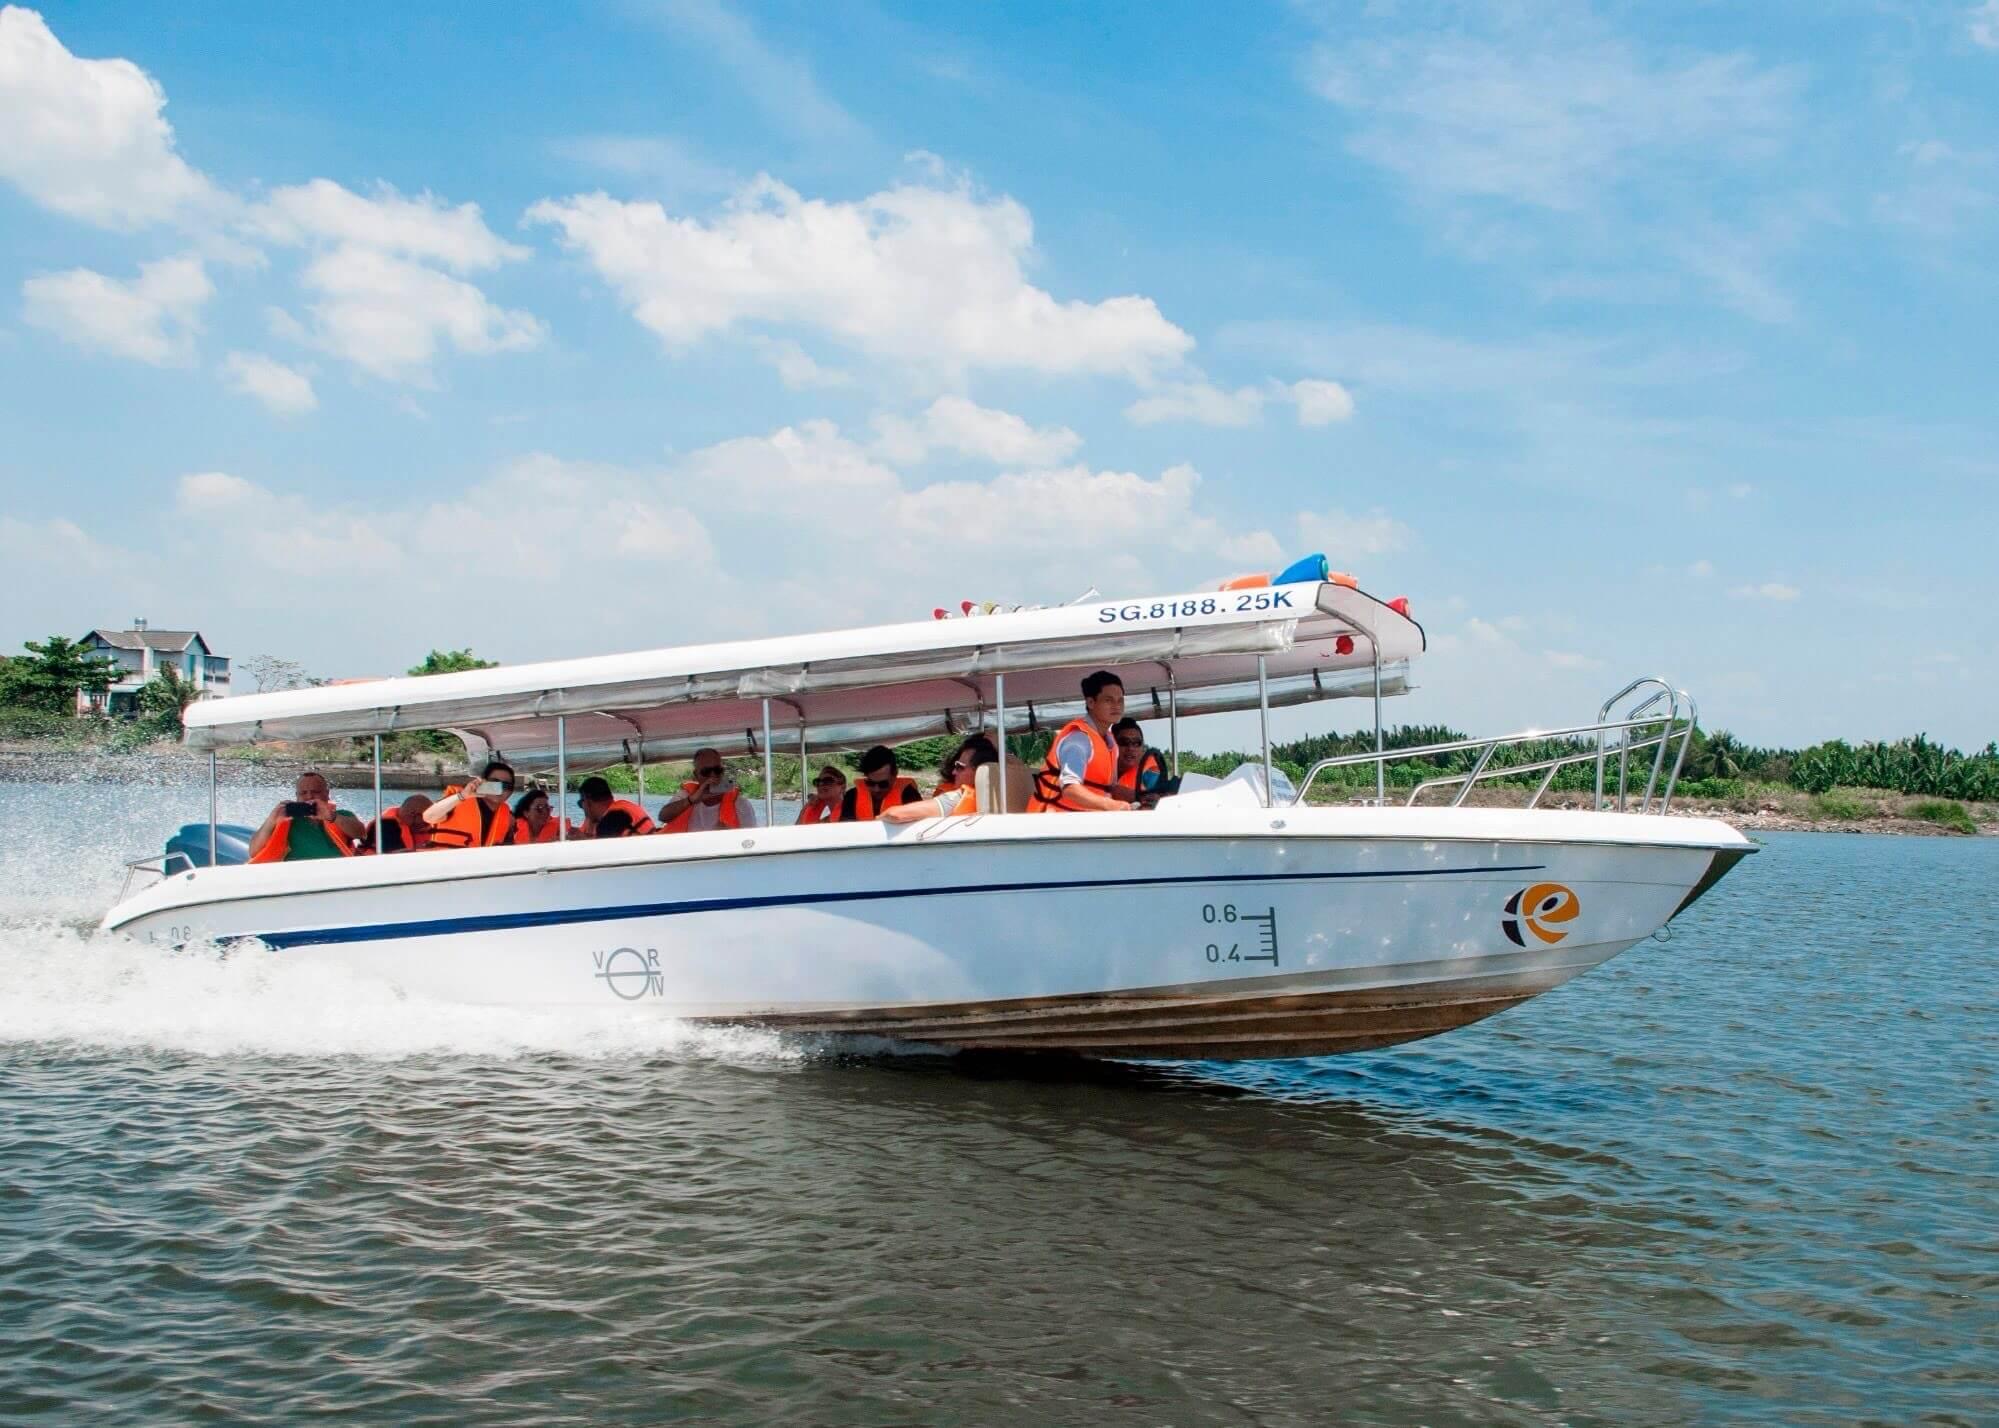 Cu Chi Tunnels Boat Tour on the Saigon River